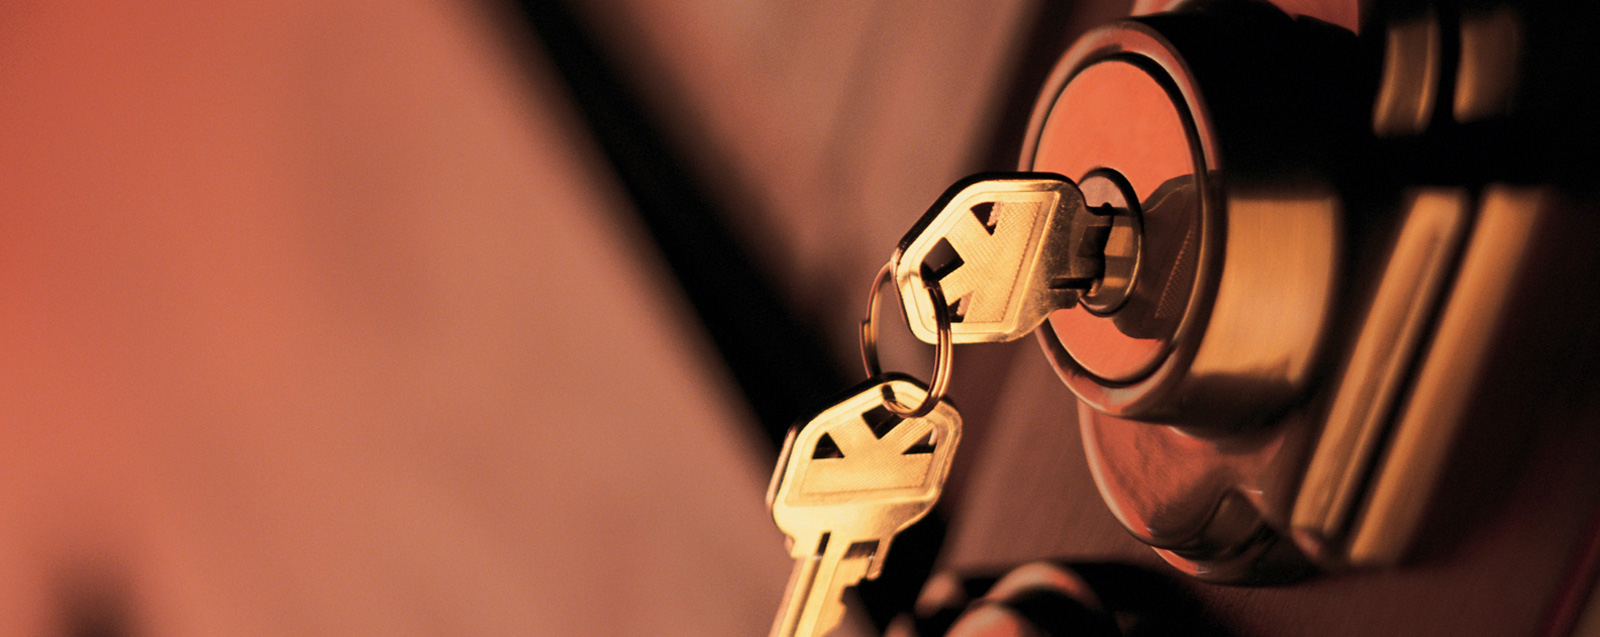 Commercial locksmith in Orlando